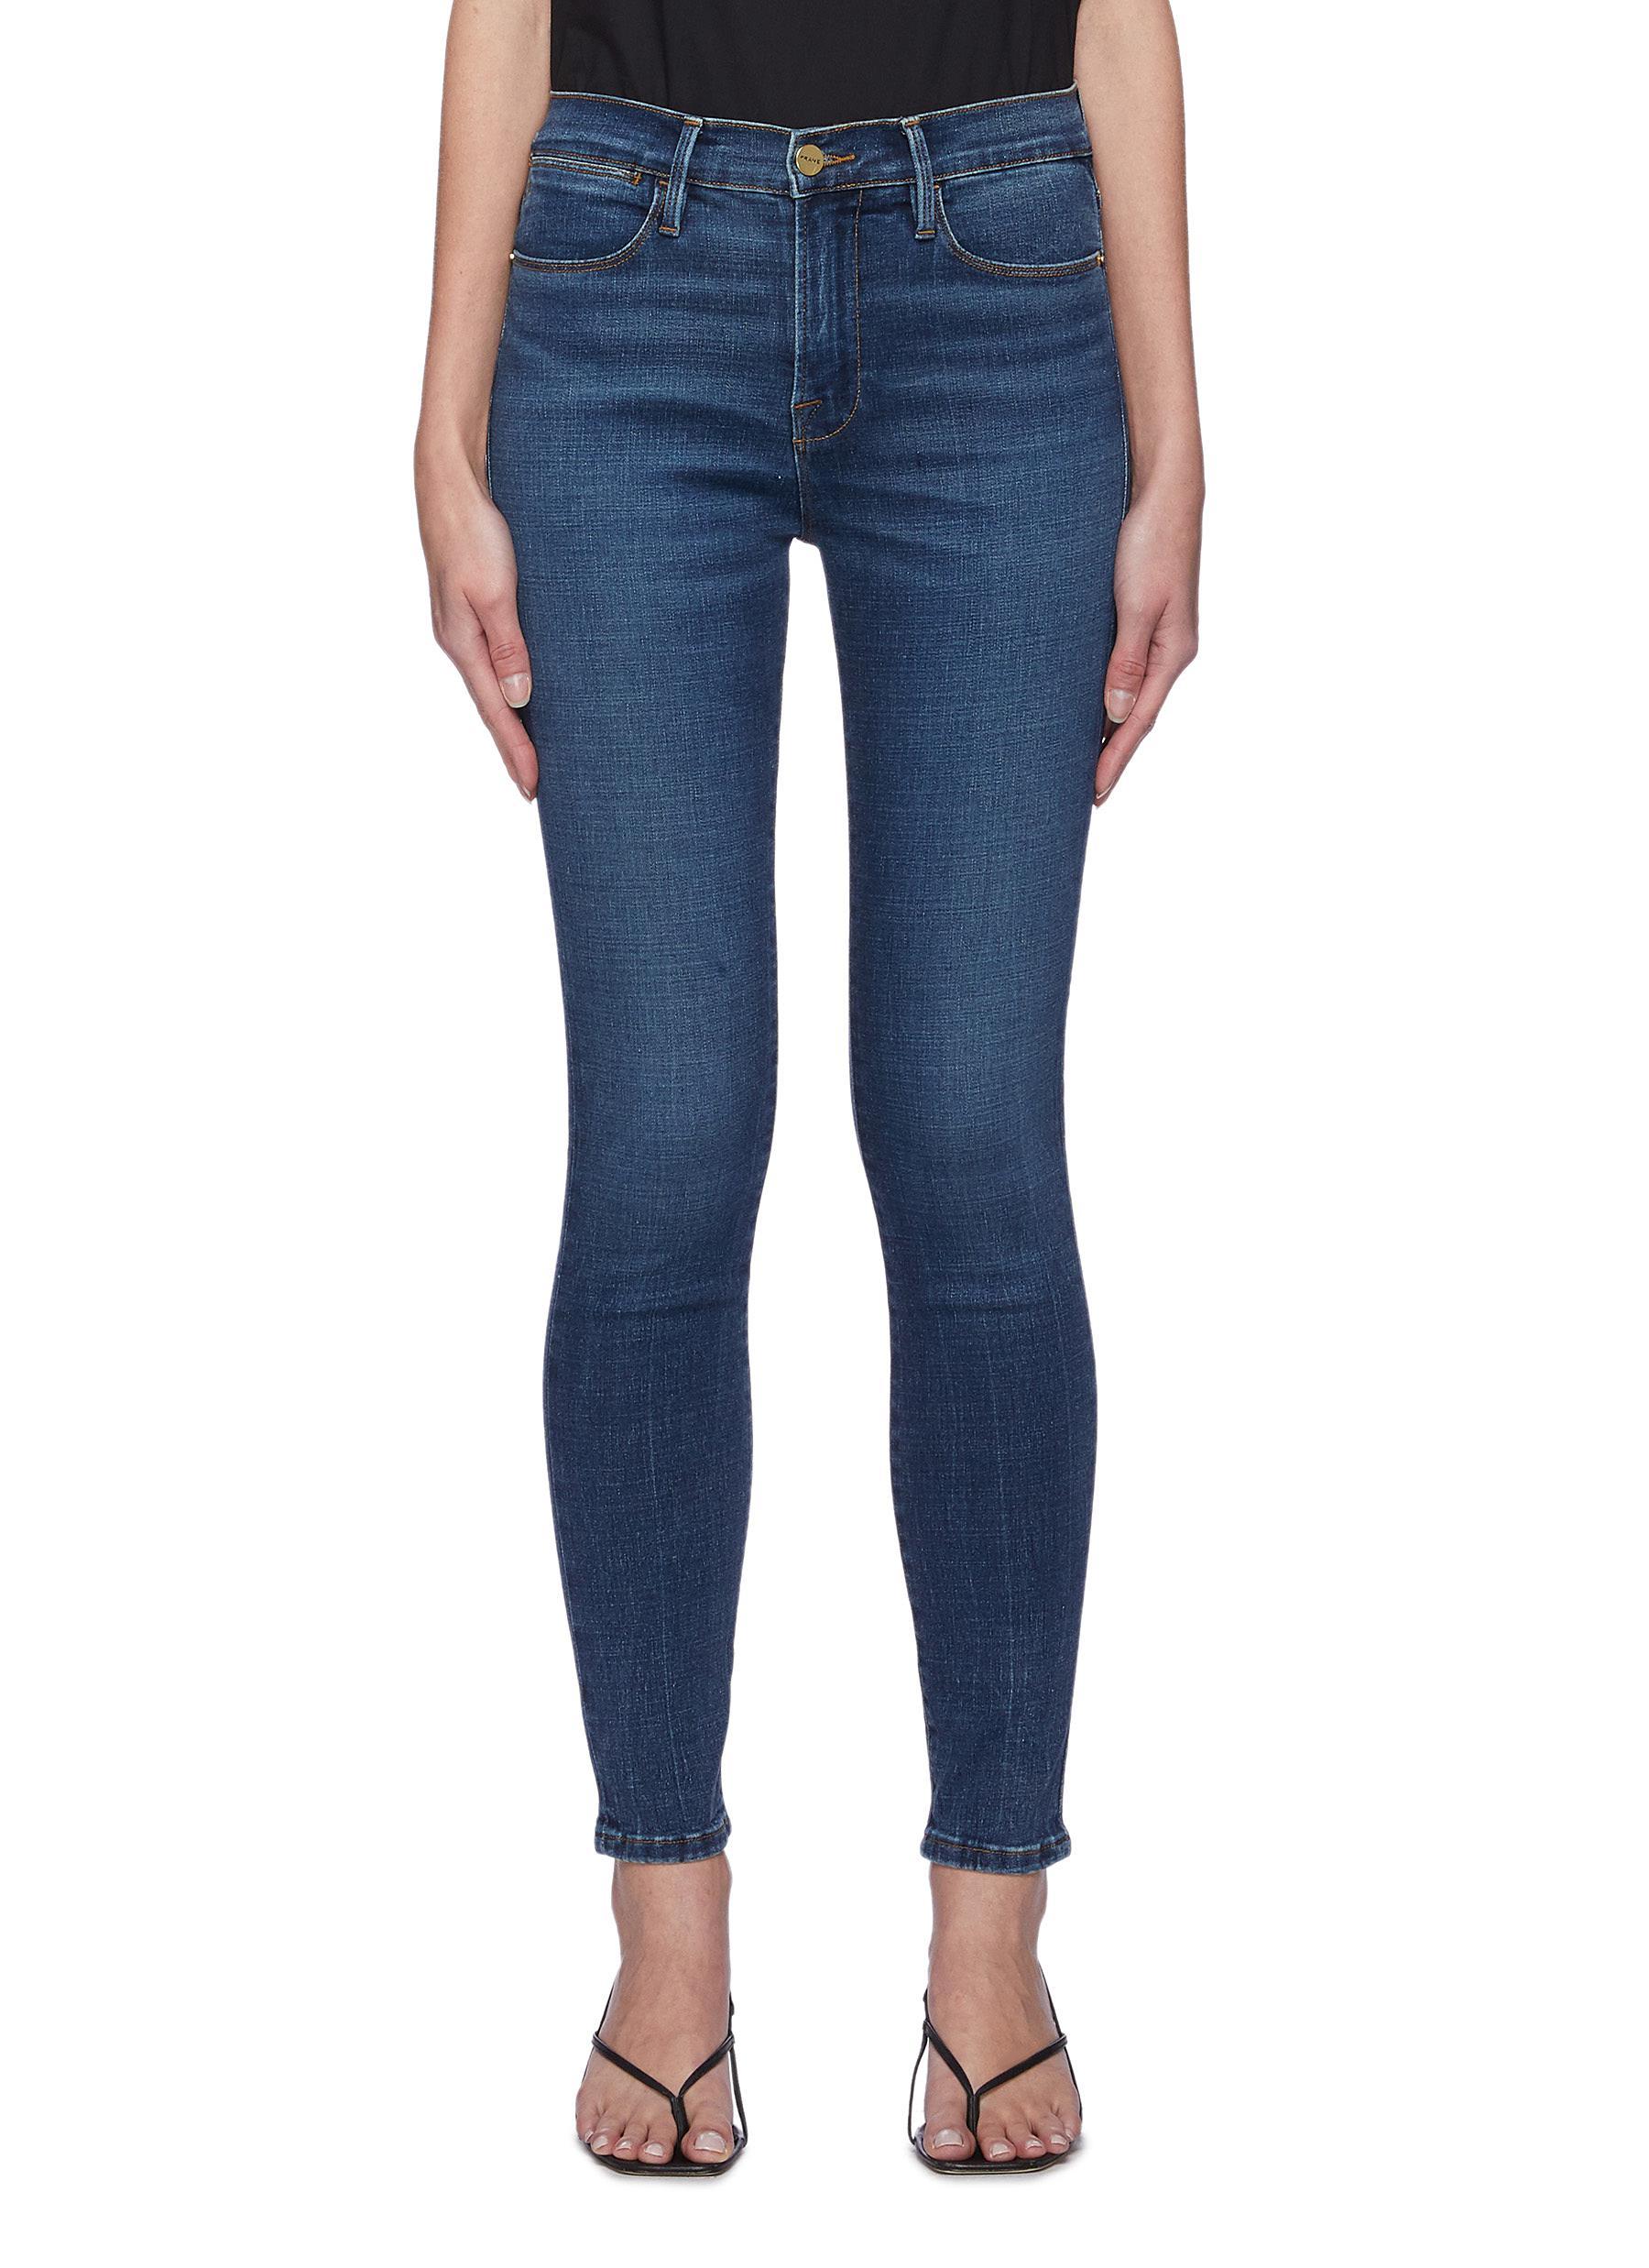 Le High Skinny' medium wash hemp jeans